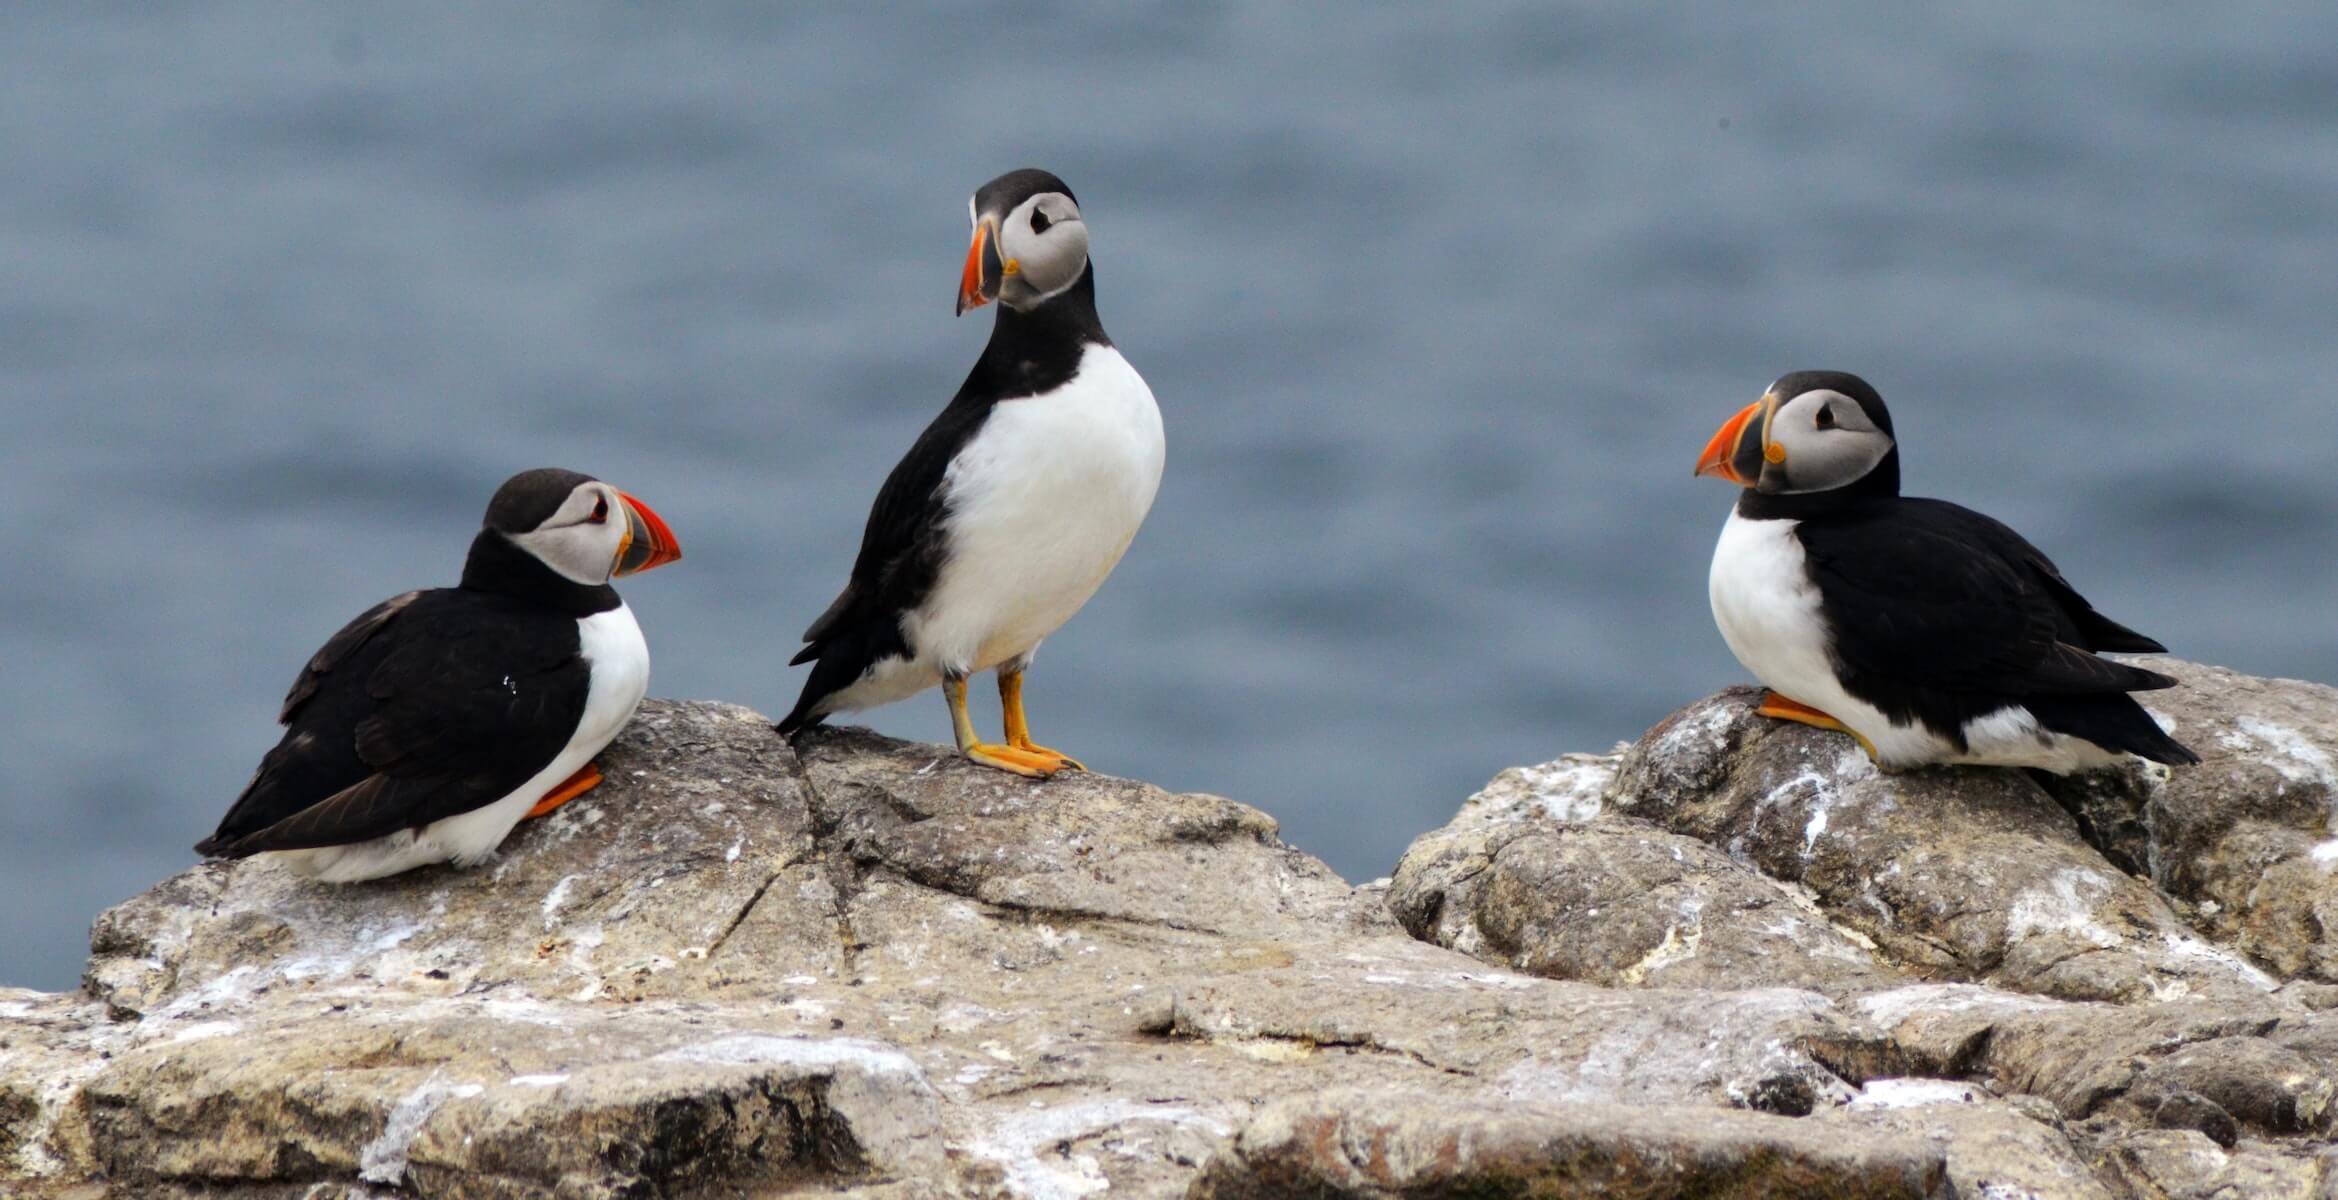 three pelicans sitting on rock overlooking ocean travel nurse trio